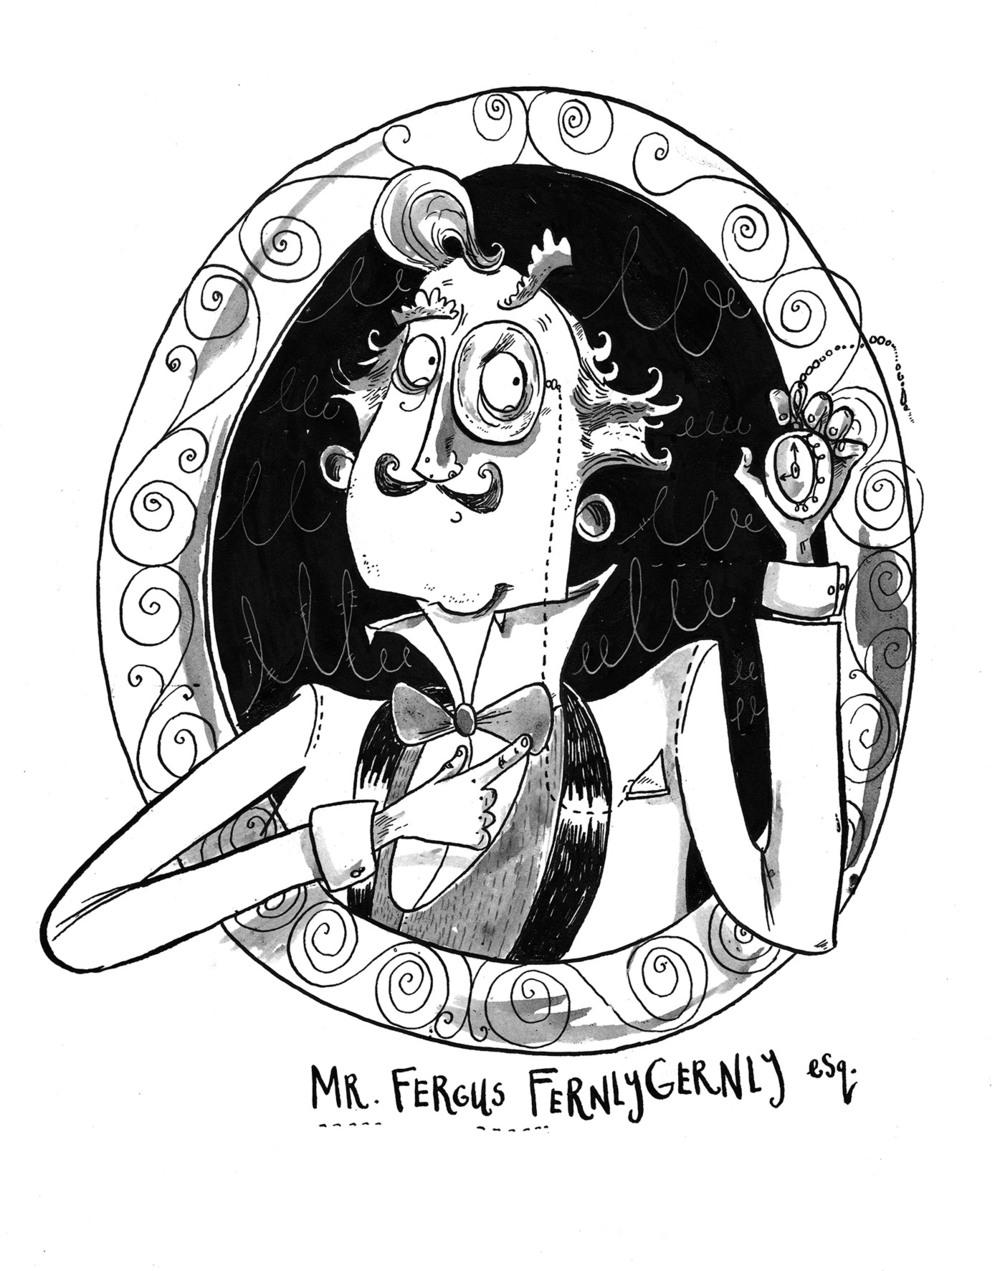 mr Fernlygernly.jpg